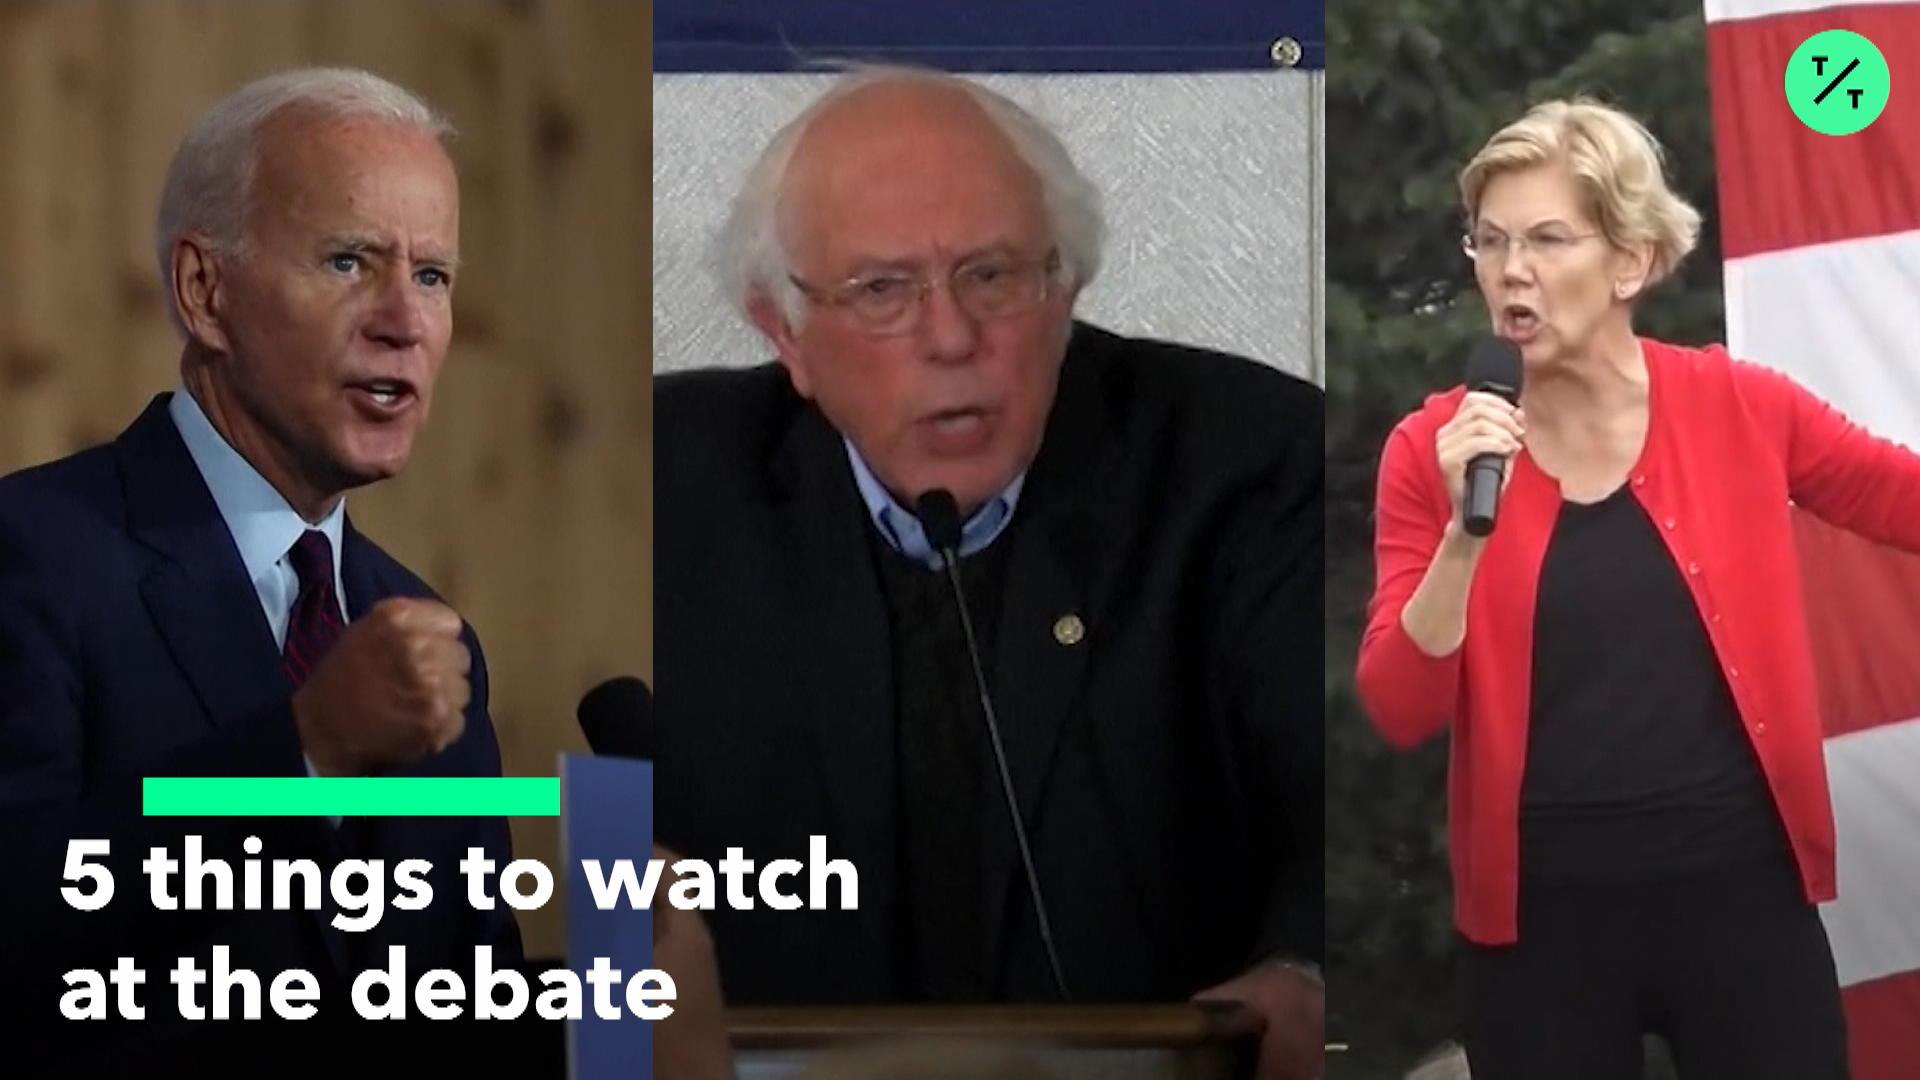 5 Things To Watch At The Debate